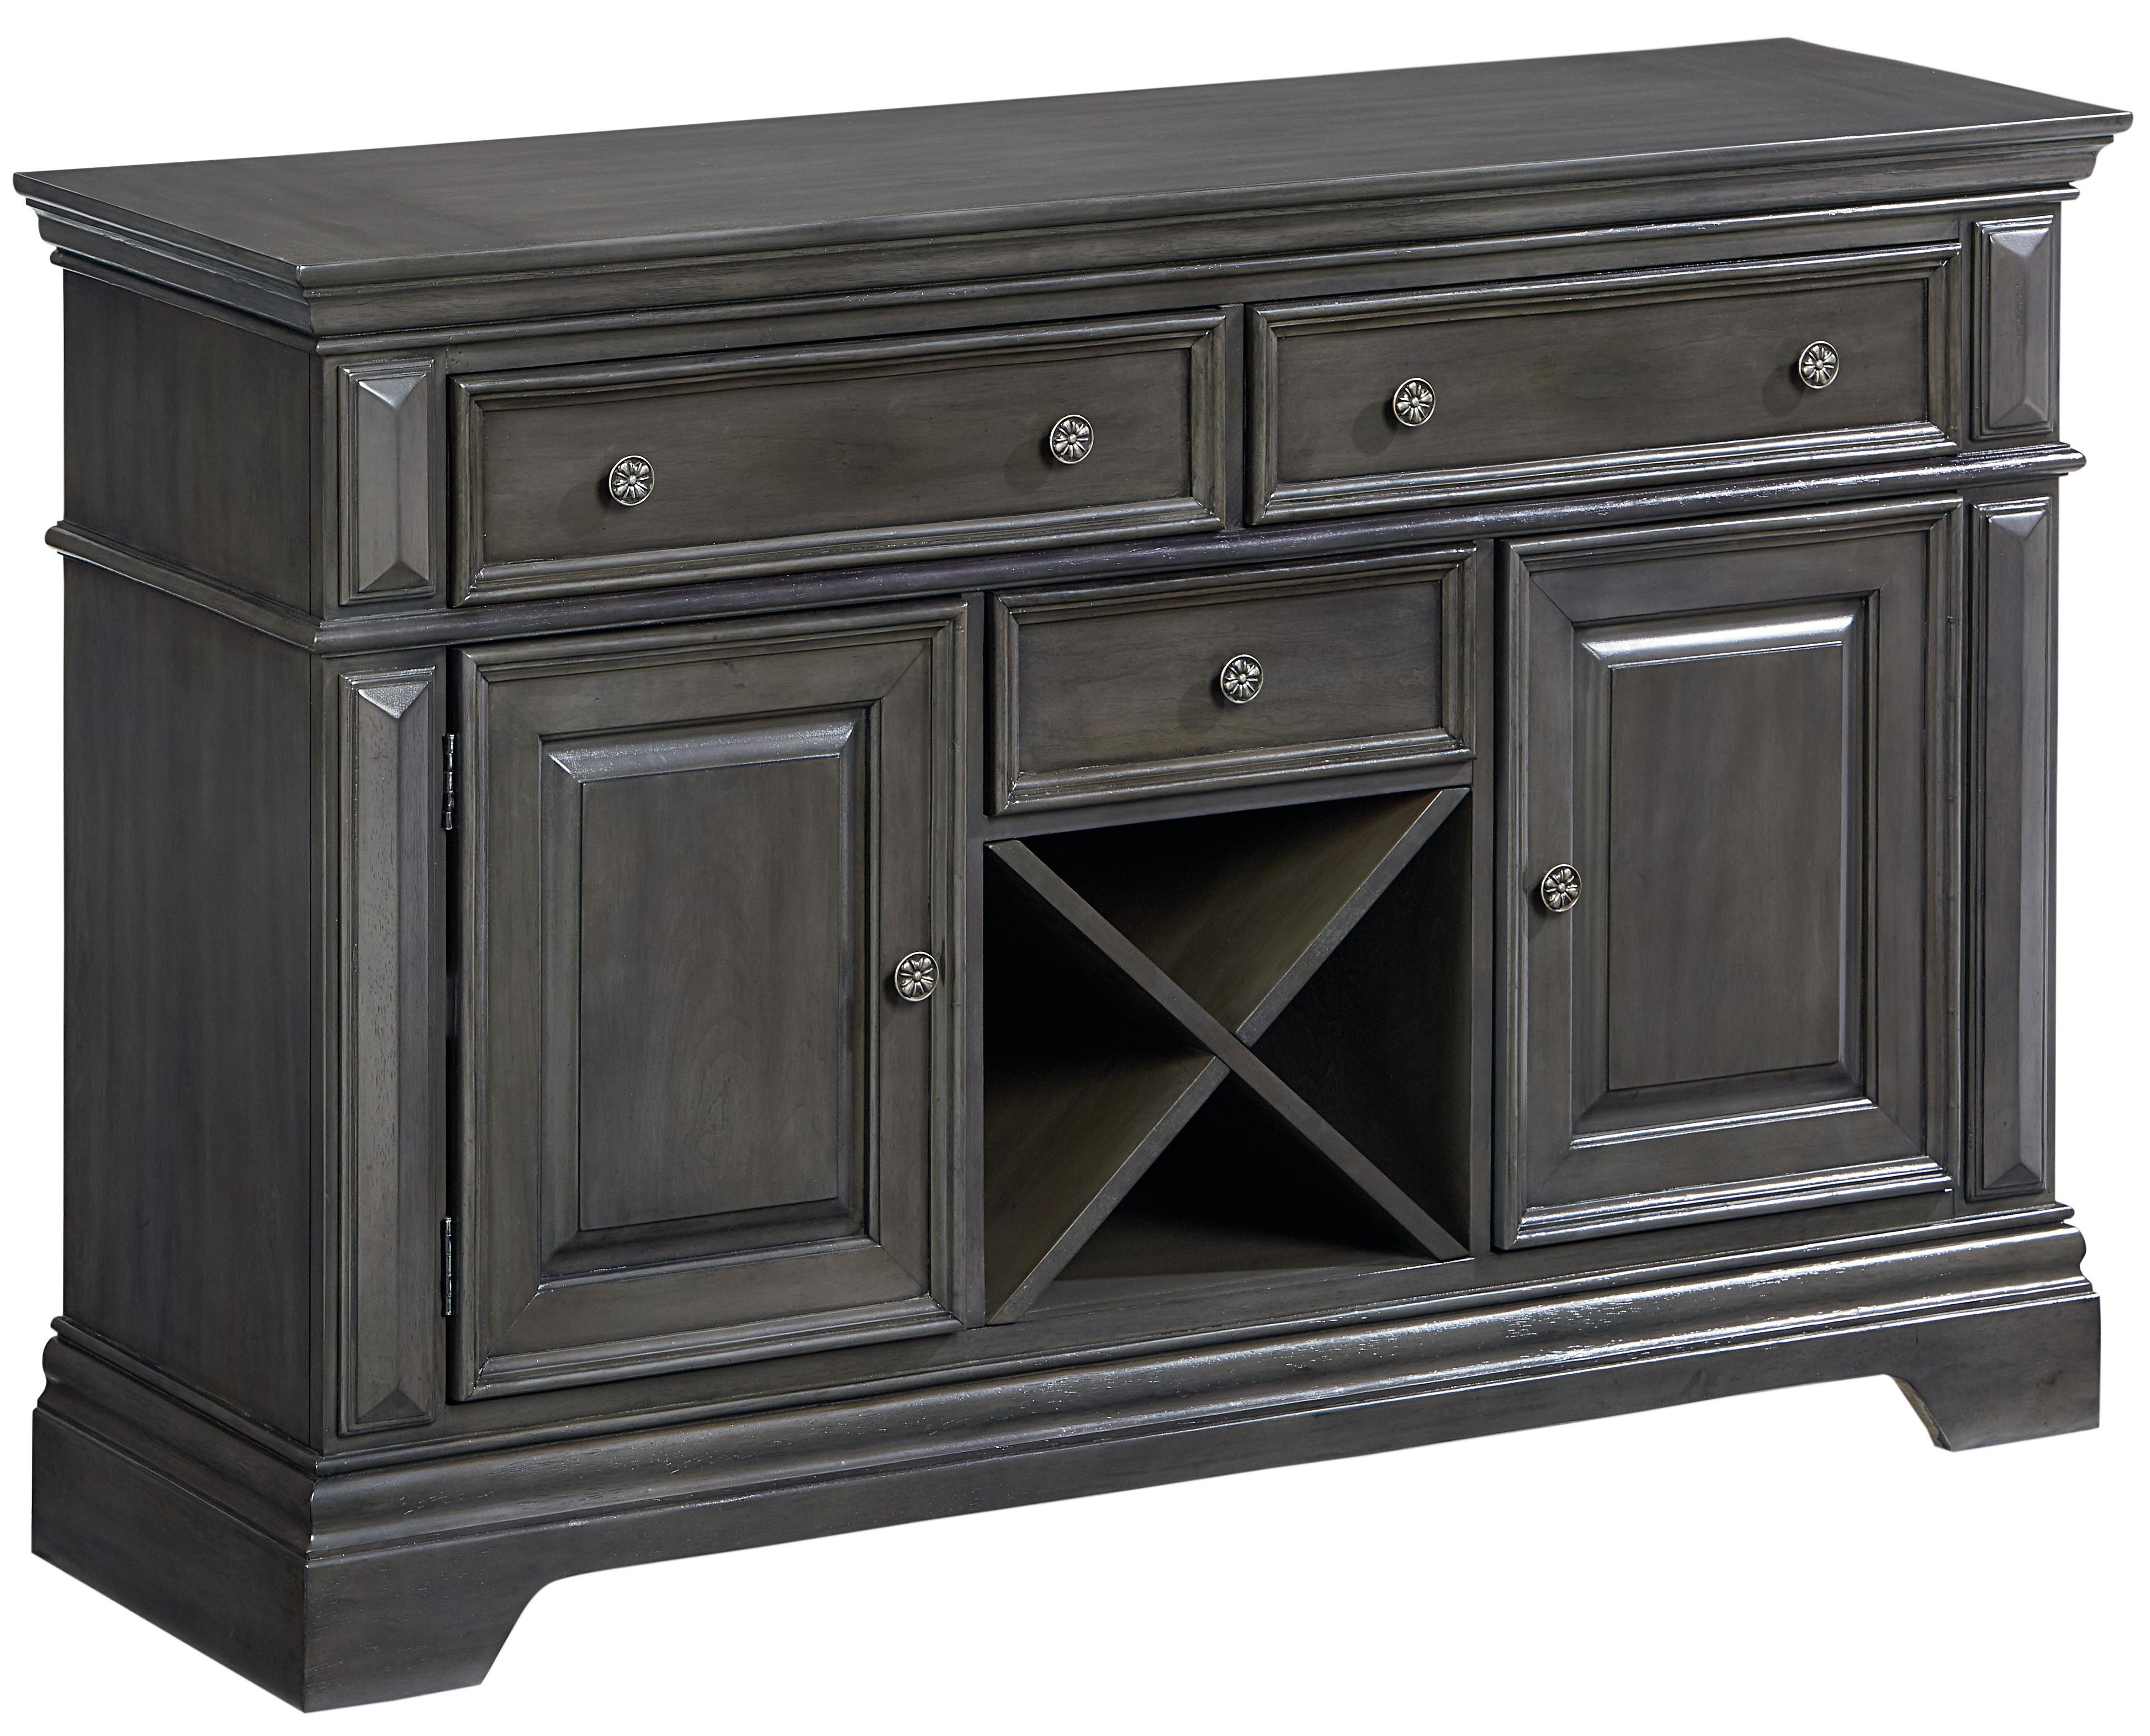 Standard Furniture Garrison Buffet                            - Item Number: 14908